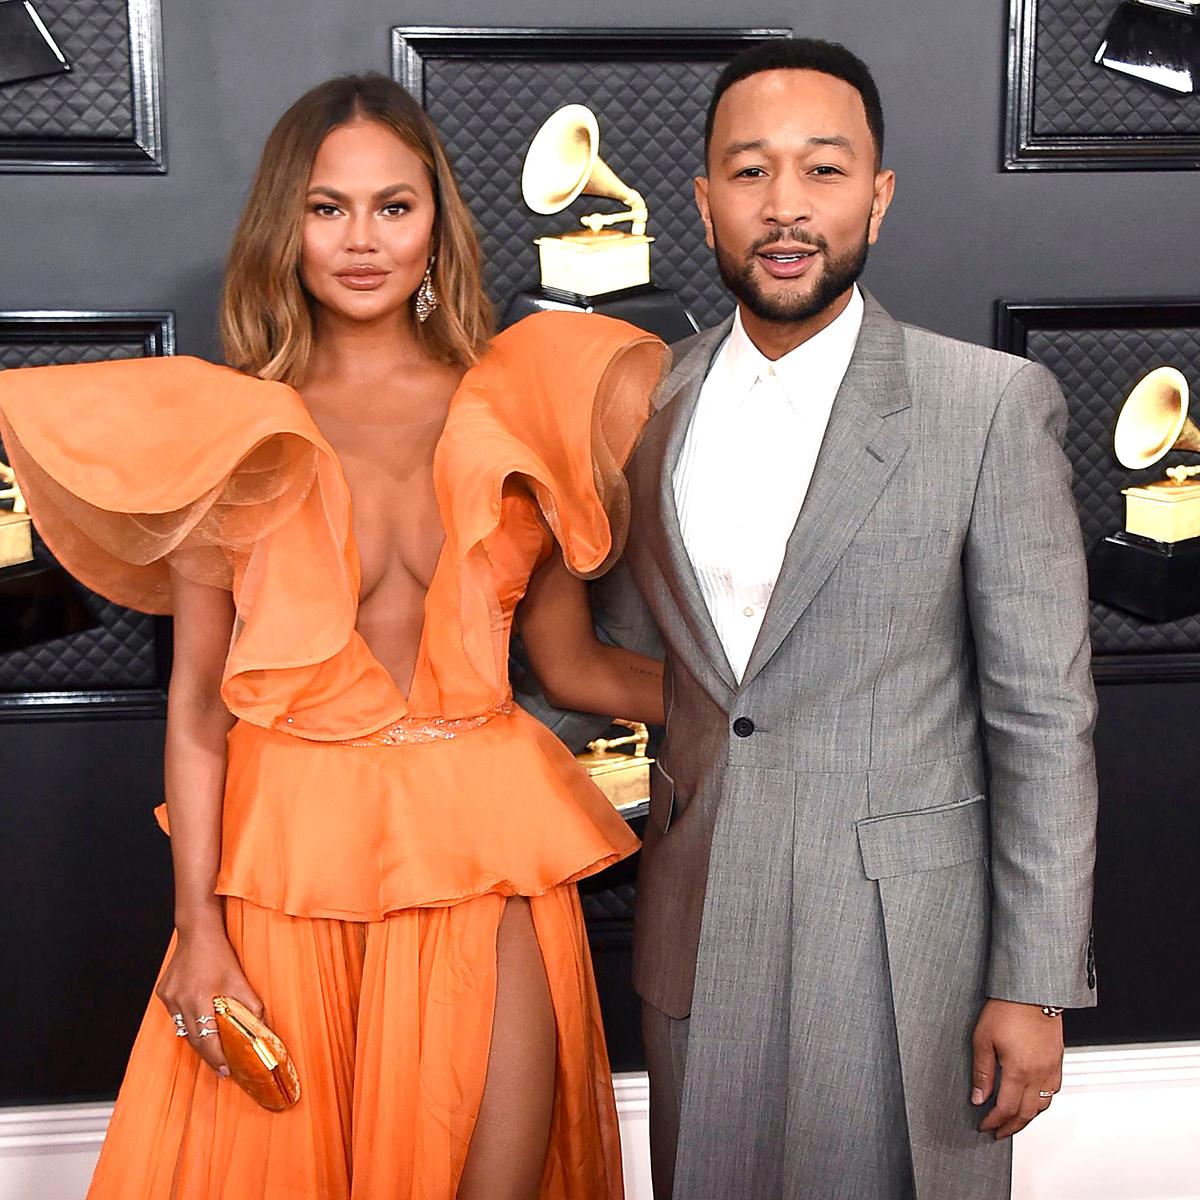 John Legend Dedicates 2020 Billboard Music Awards Performance to Chrissy Teigen After Pregnancy Loss